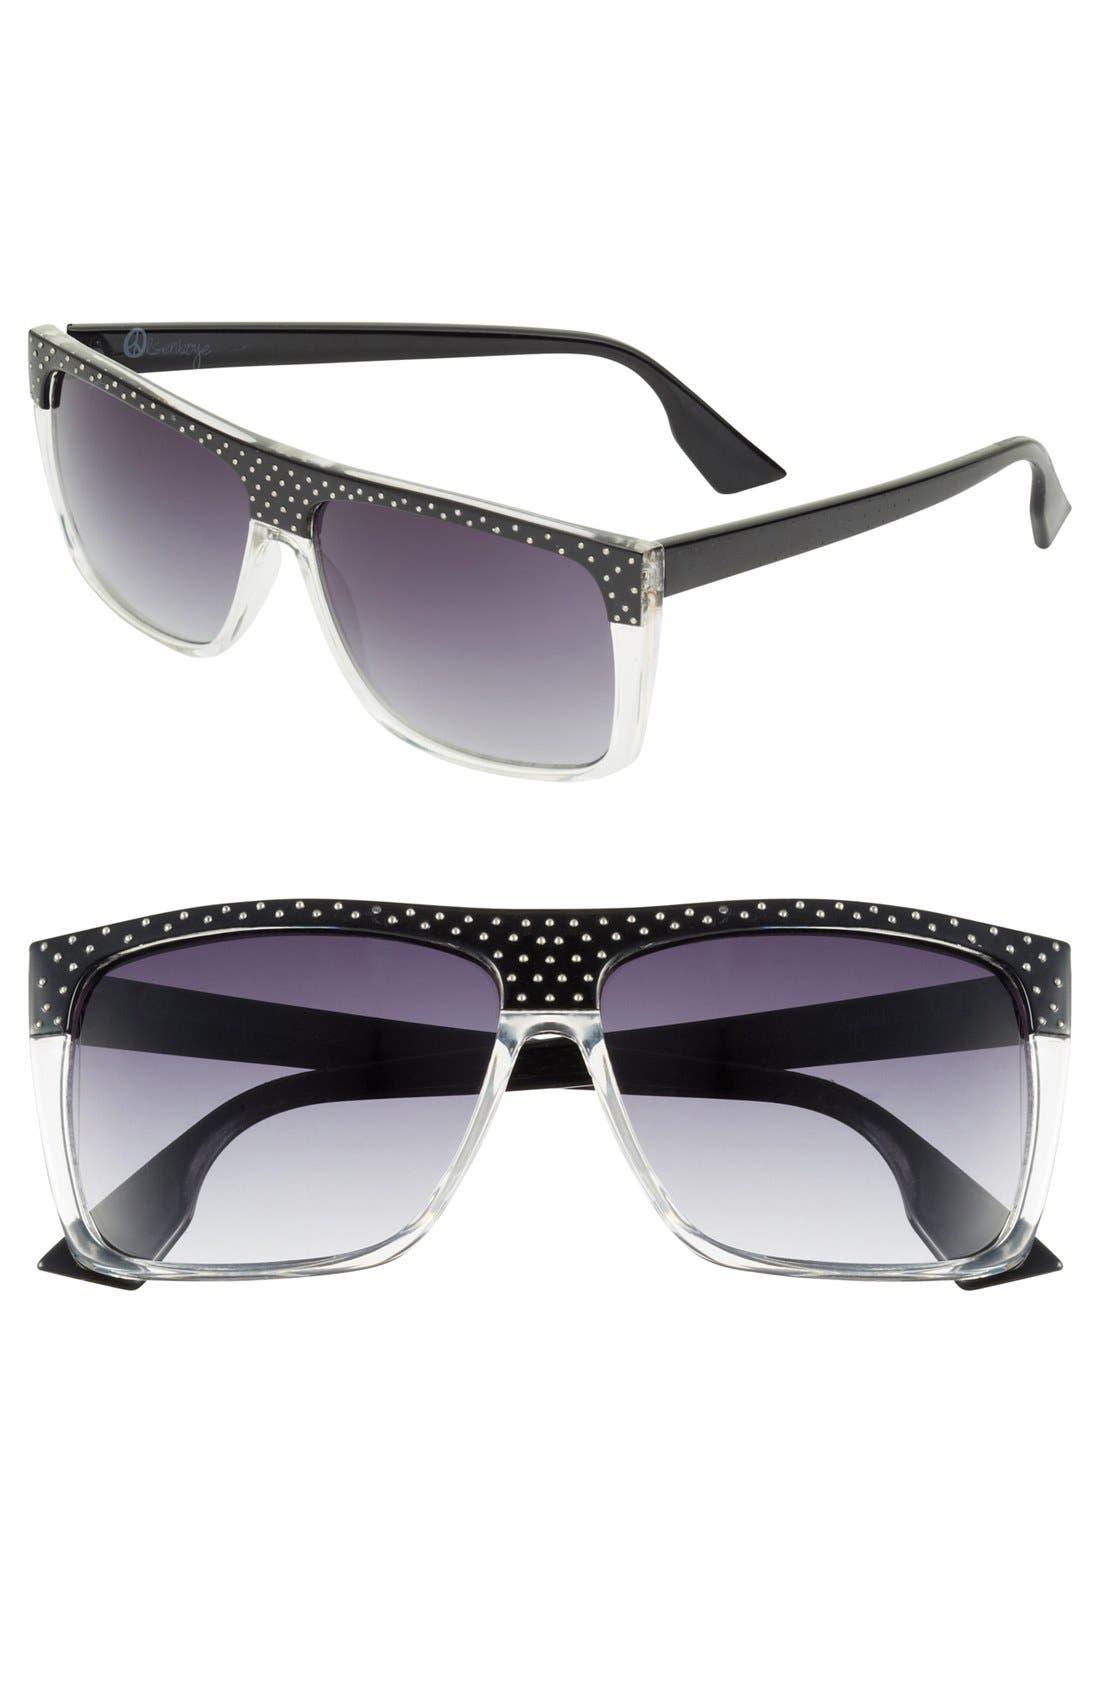 Main Image - Outlook Eyewear 'Guggenheim' 59mm Sunglasses